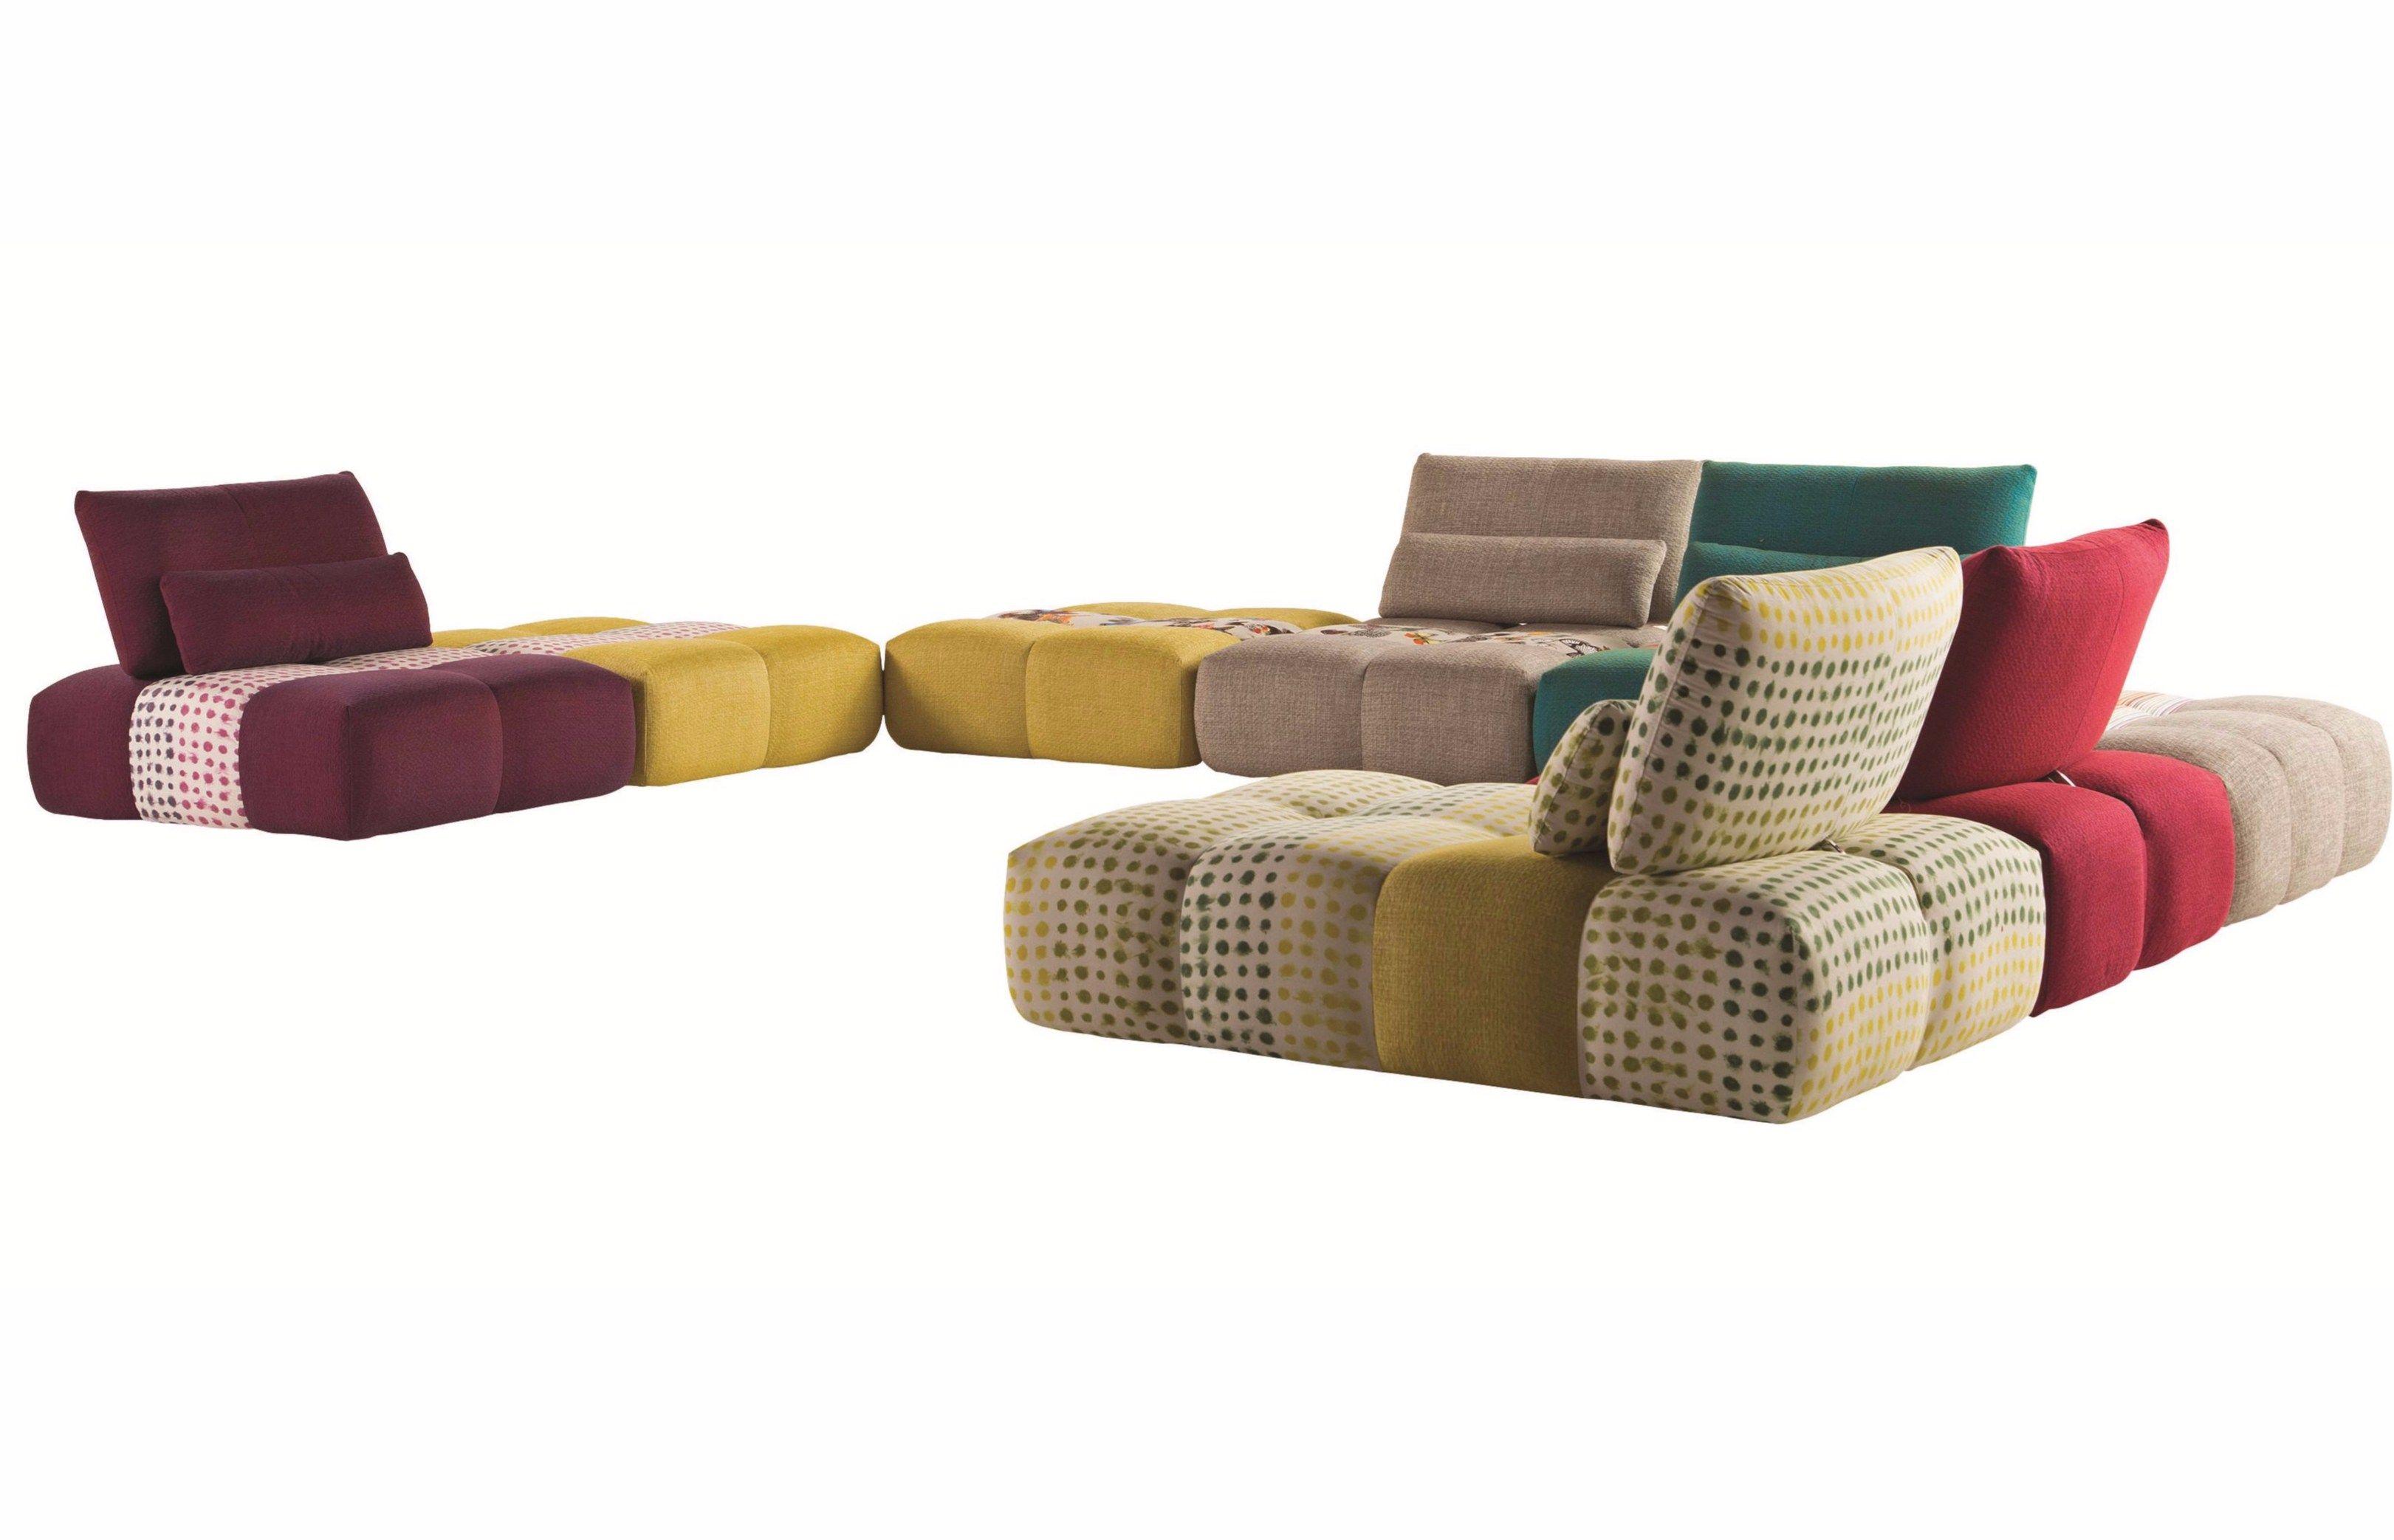 roche bobois long island sofa preis. Black Bedroom Furniture Sets. Home Design Ideas